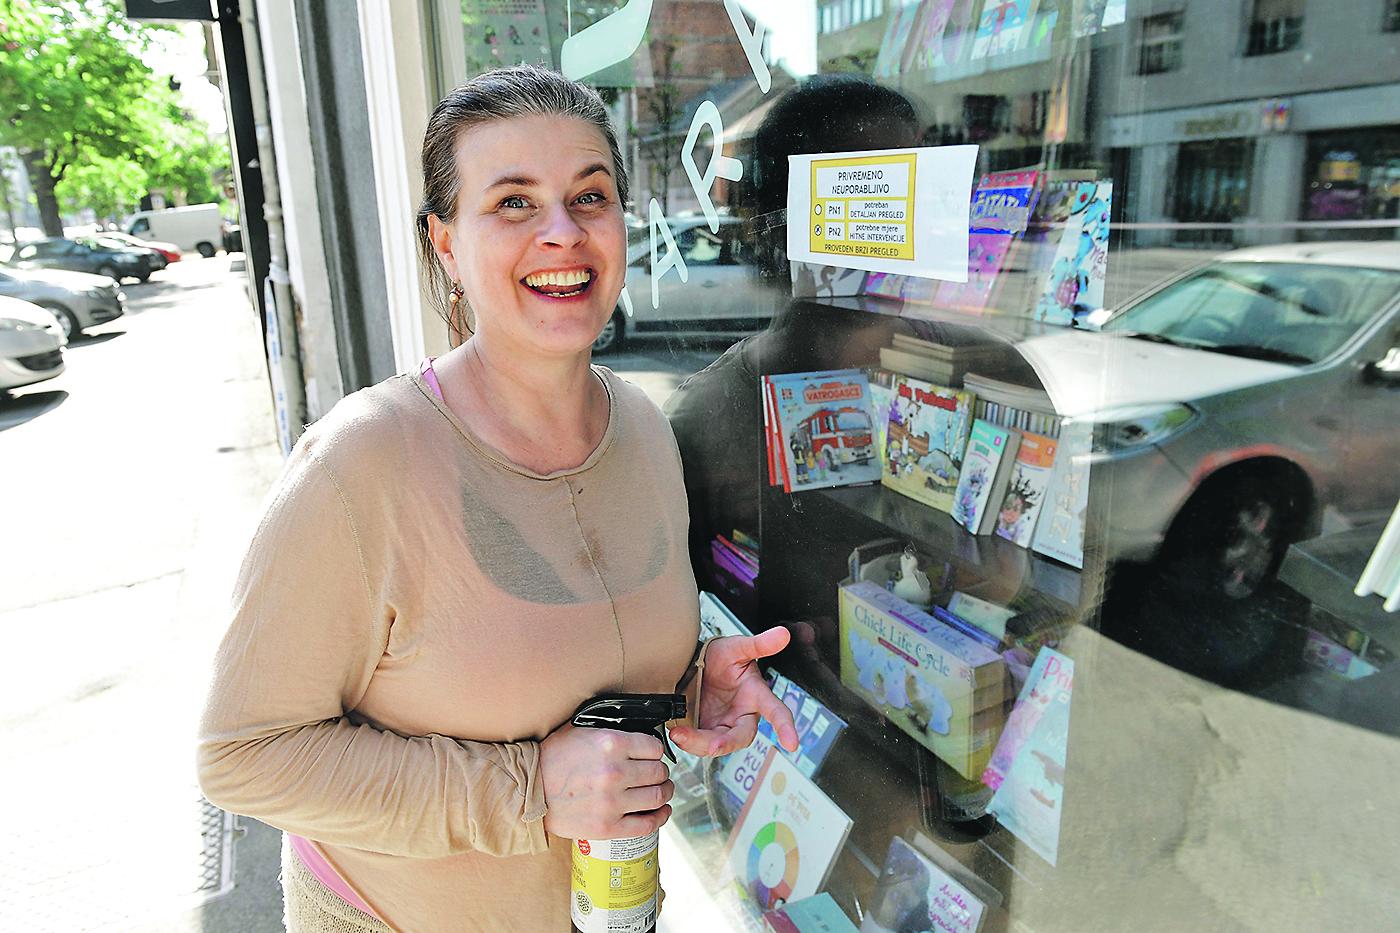 Zagreb, 240420. Maksimirska 39. Martina Petrinjak, vlasnica male knjizare Bookara u Maksimirskoj. Foto: Goran Mehkek / CROPIX